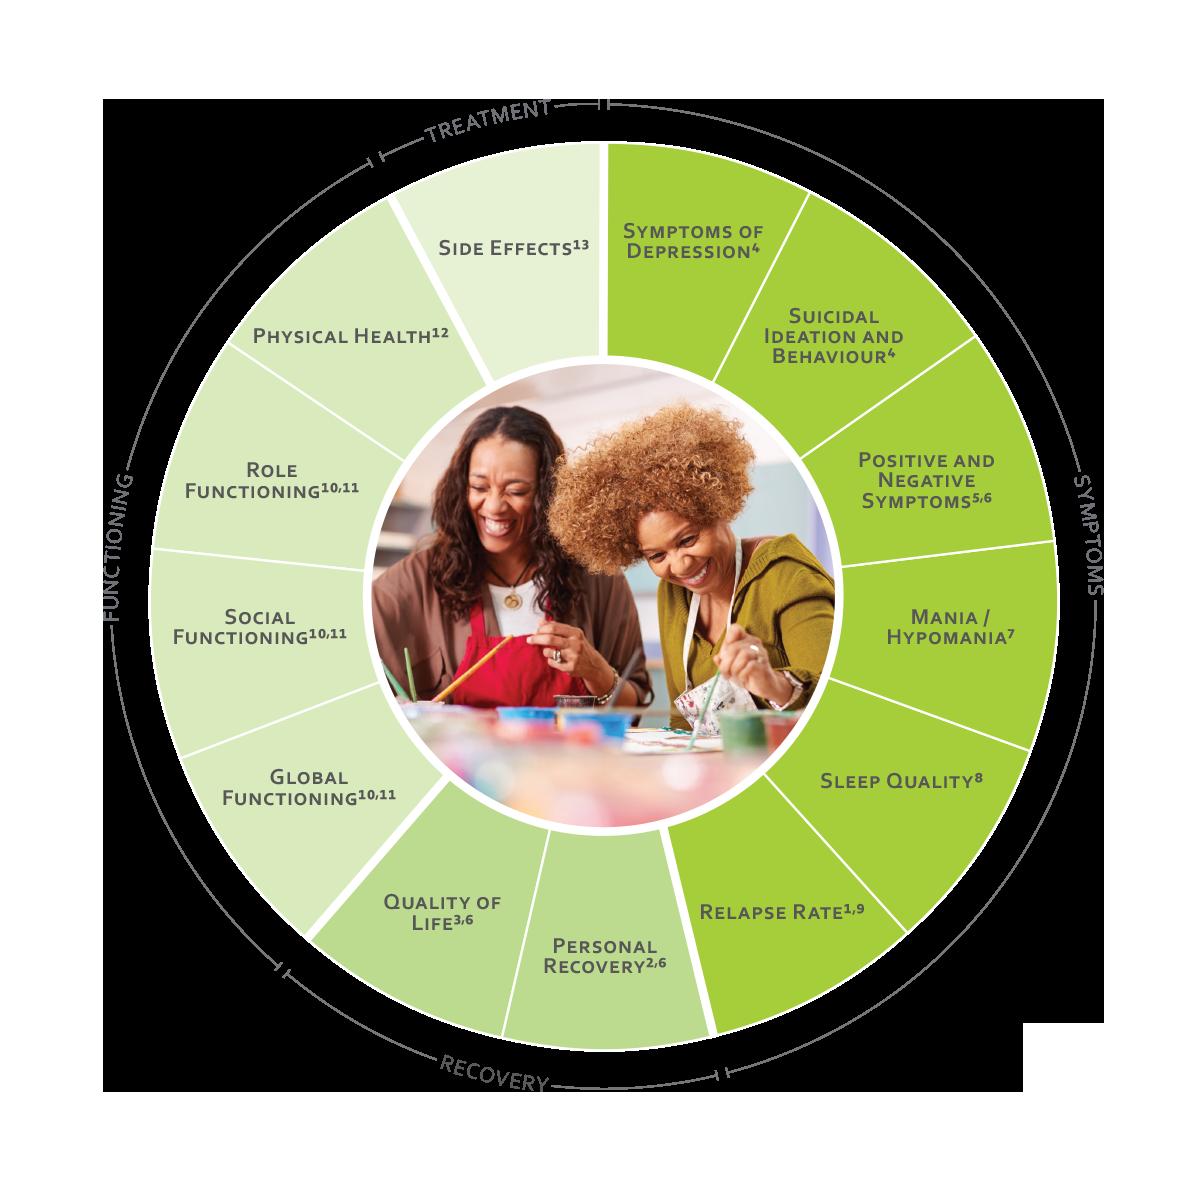 ICHOM Standard Sets Psychotic Disorders Outcomes Wheel